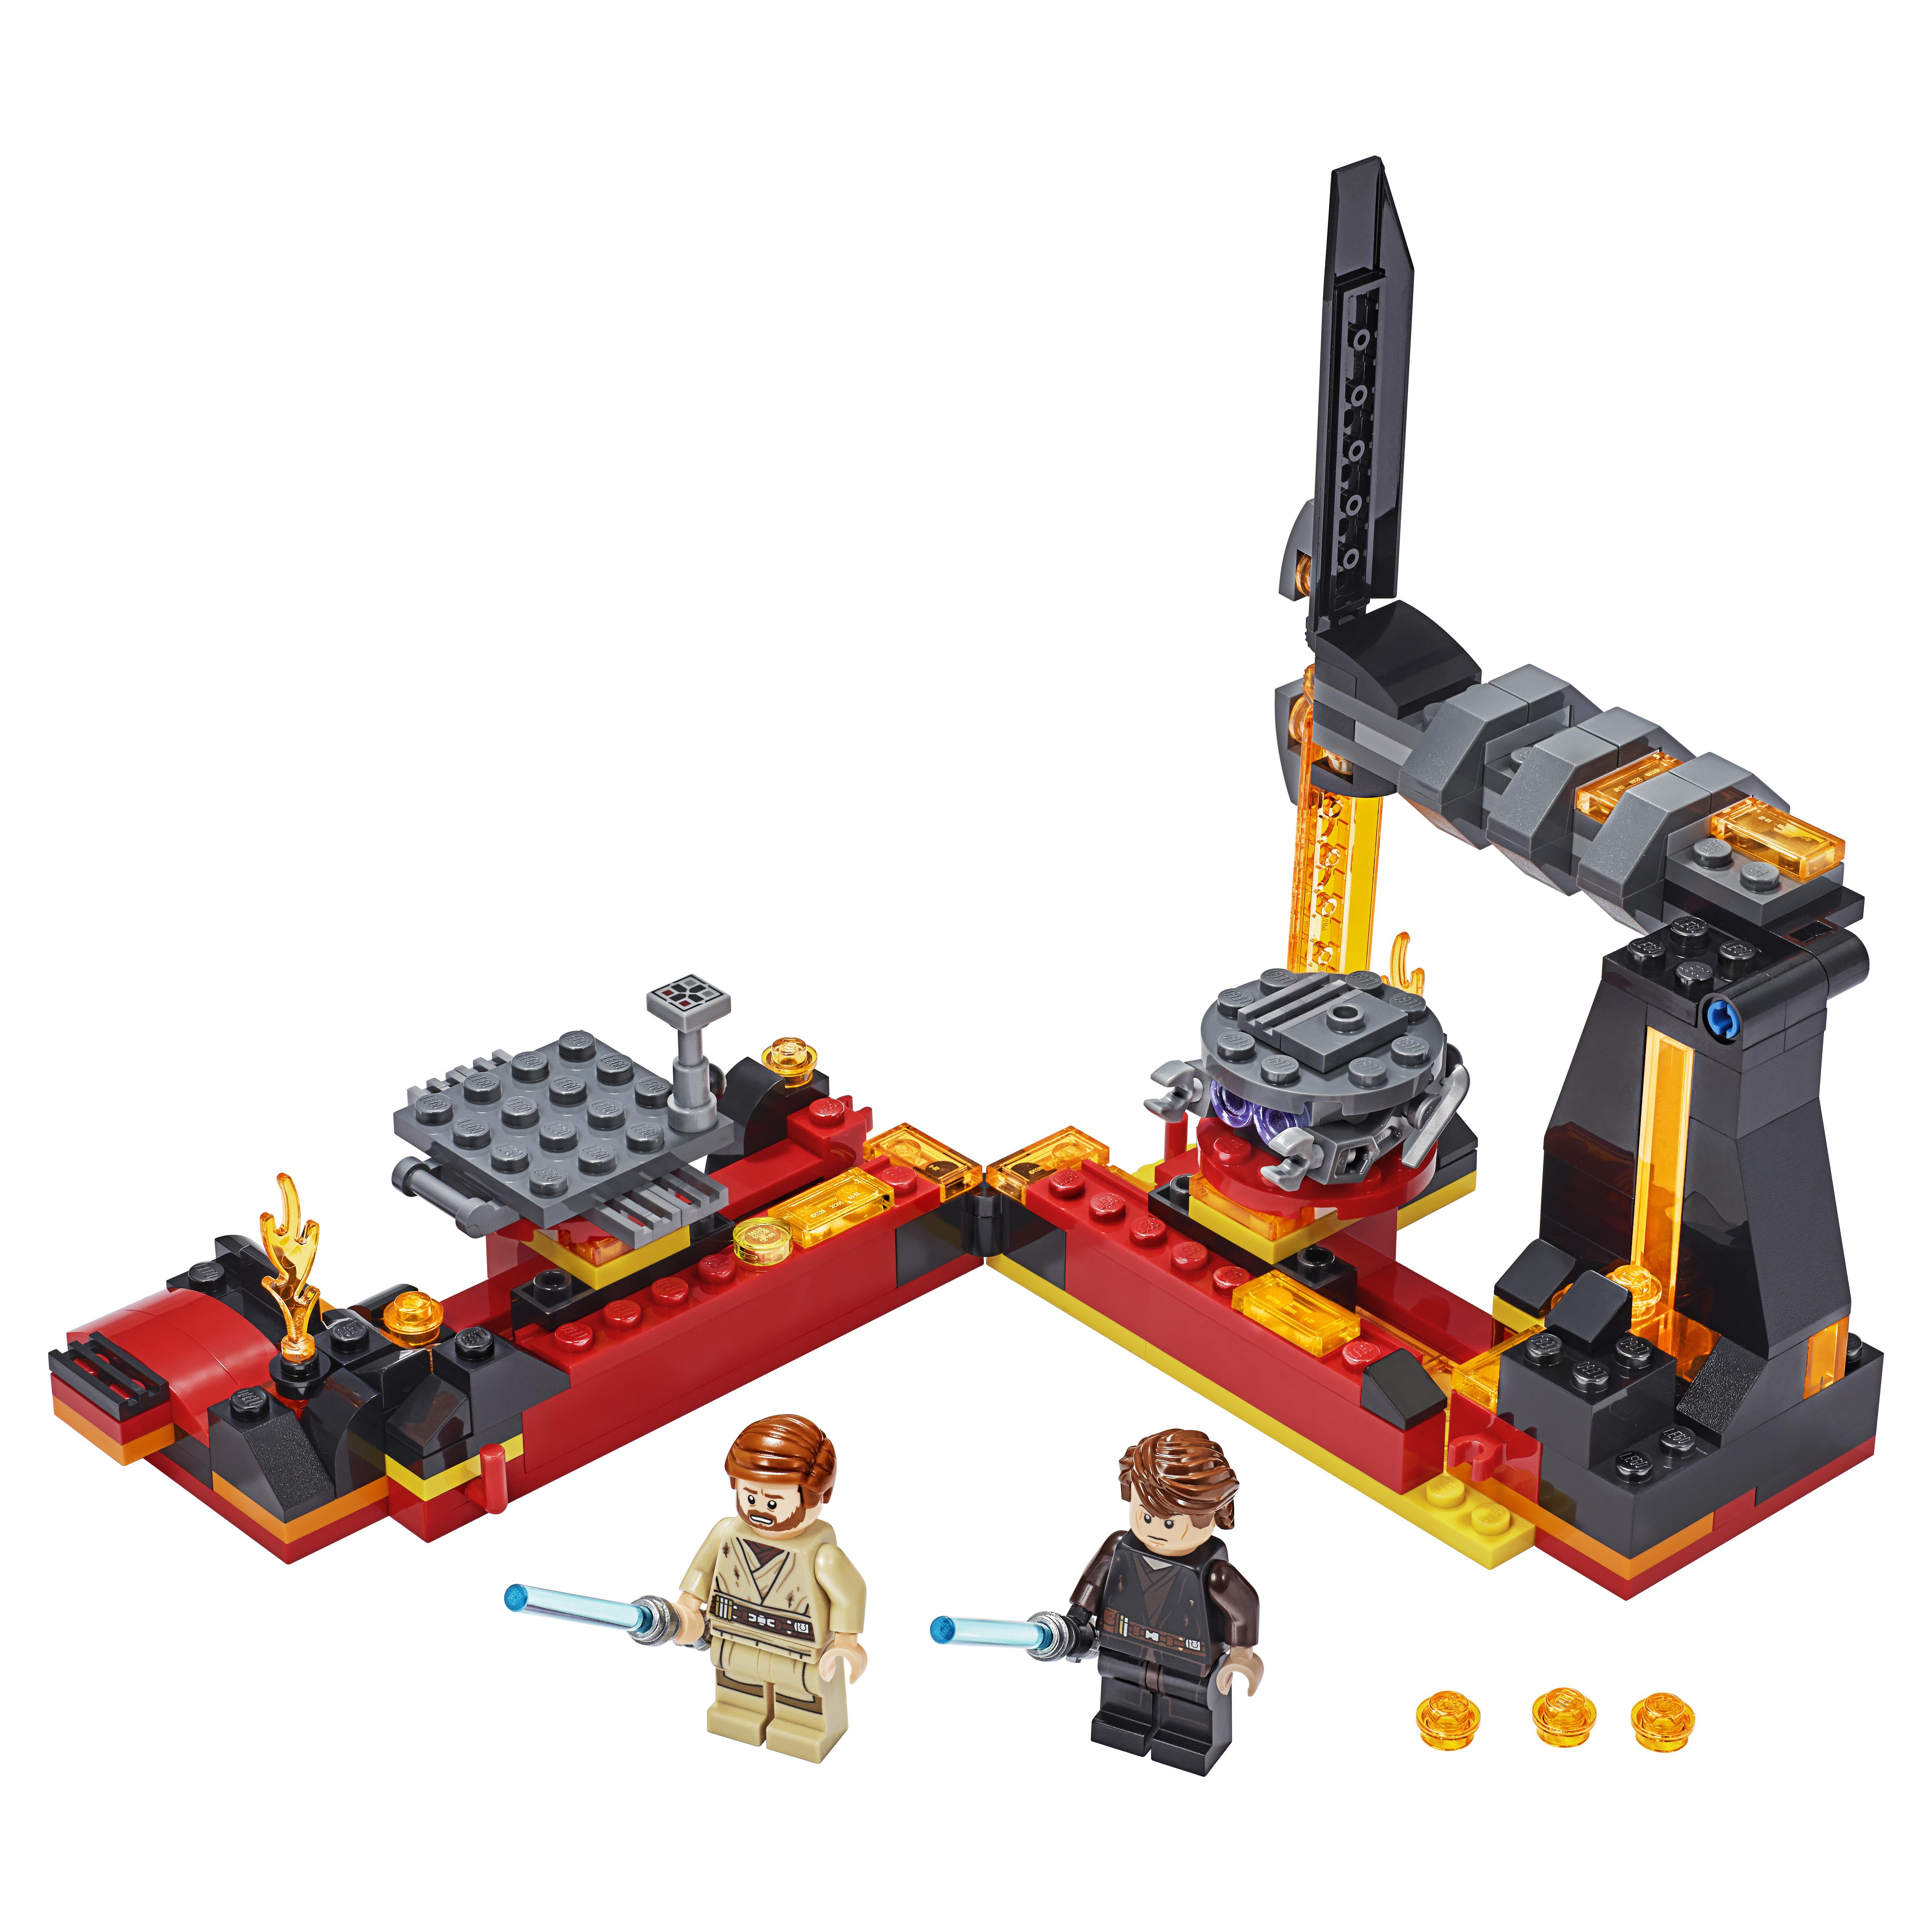 Конструктор LEGO Star Wars 75269 Бой